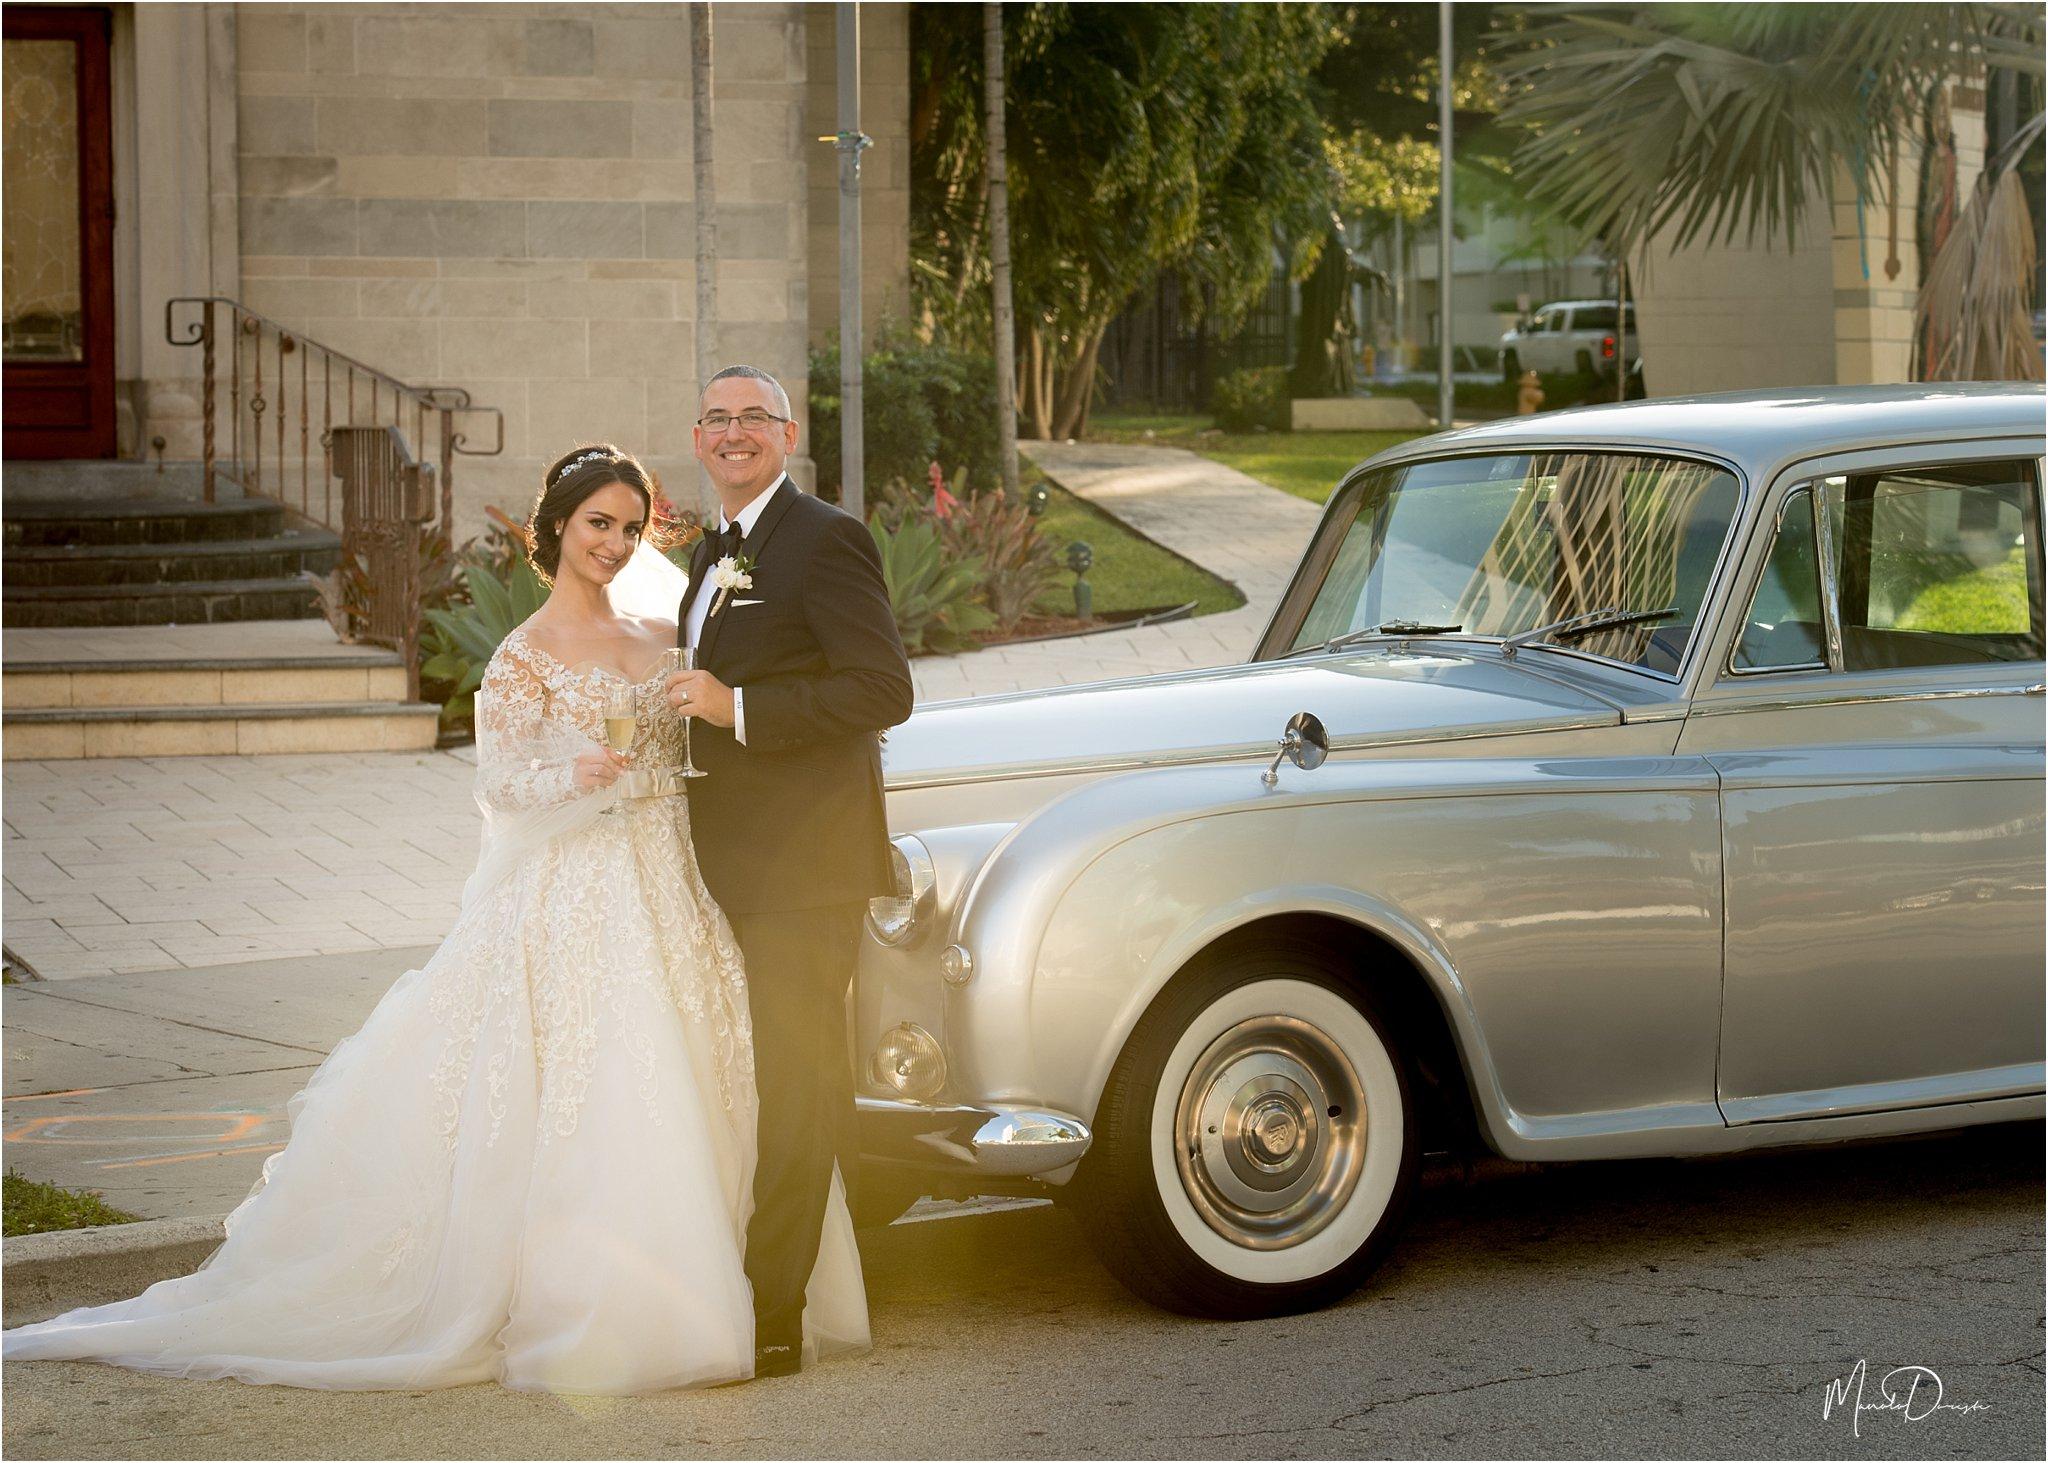 00726_ManoloDoreste_InFocusStudios_Wedding_Family_Photography_Miami_MiamiPhotographer.jpg